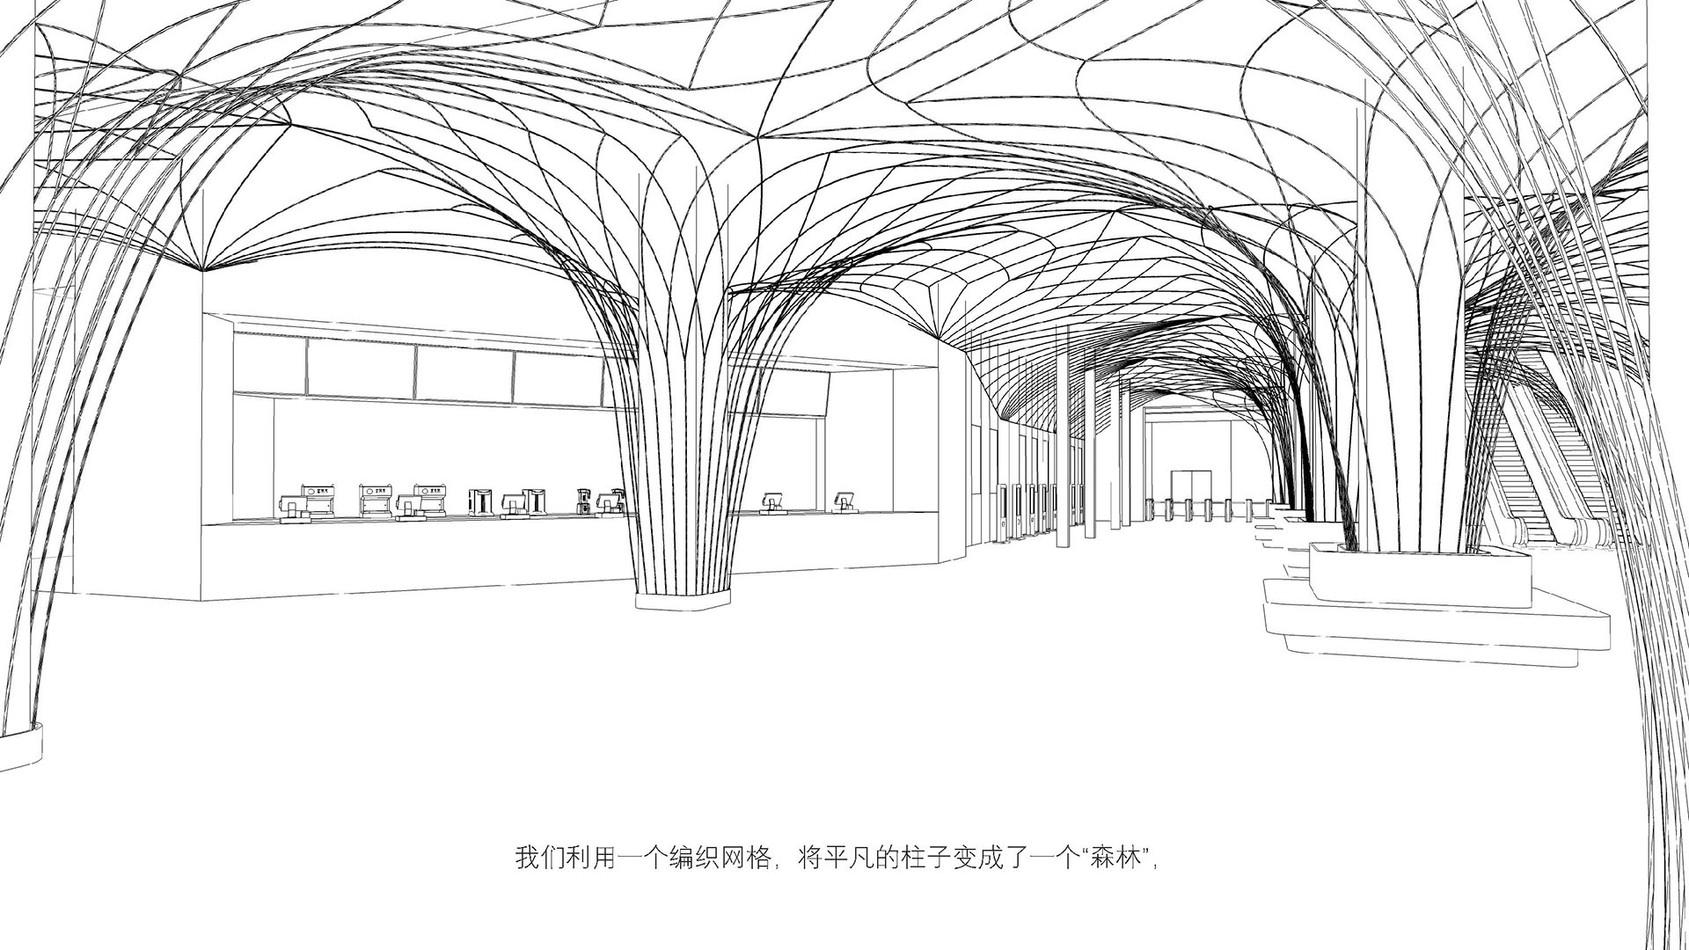 CHONGQING-EMPEROR-CINEMA-ZH 03.jpg